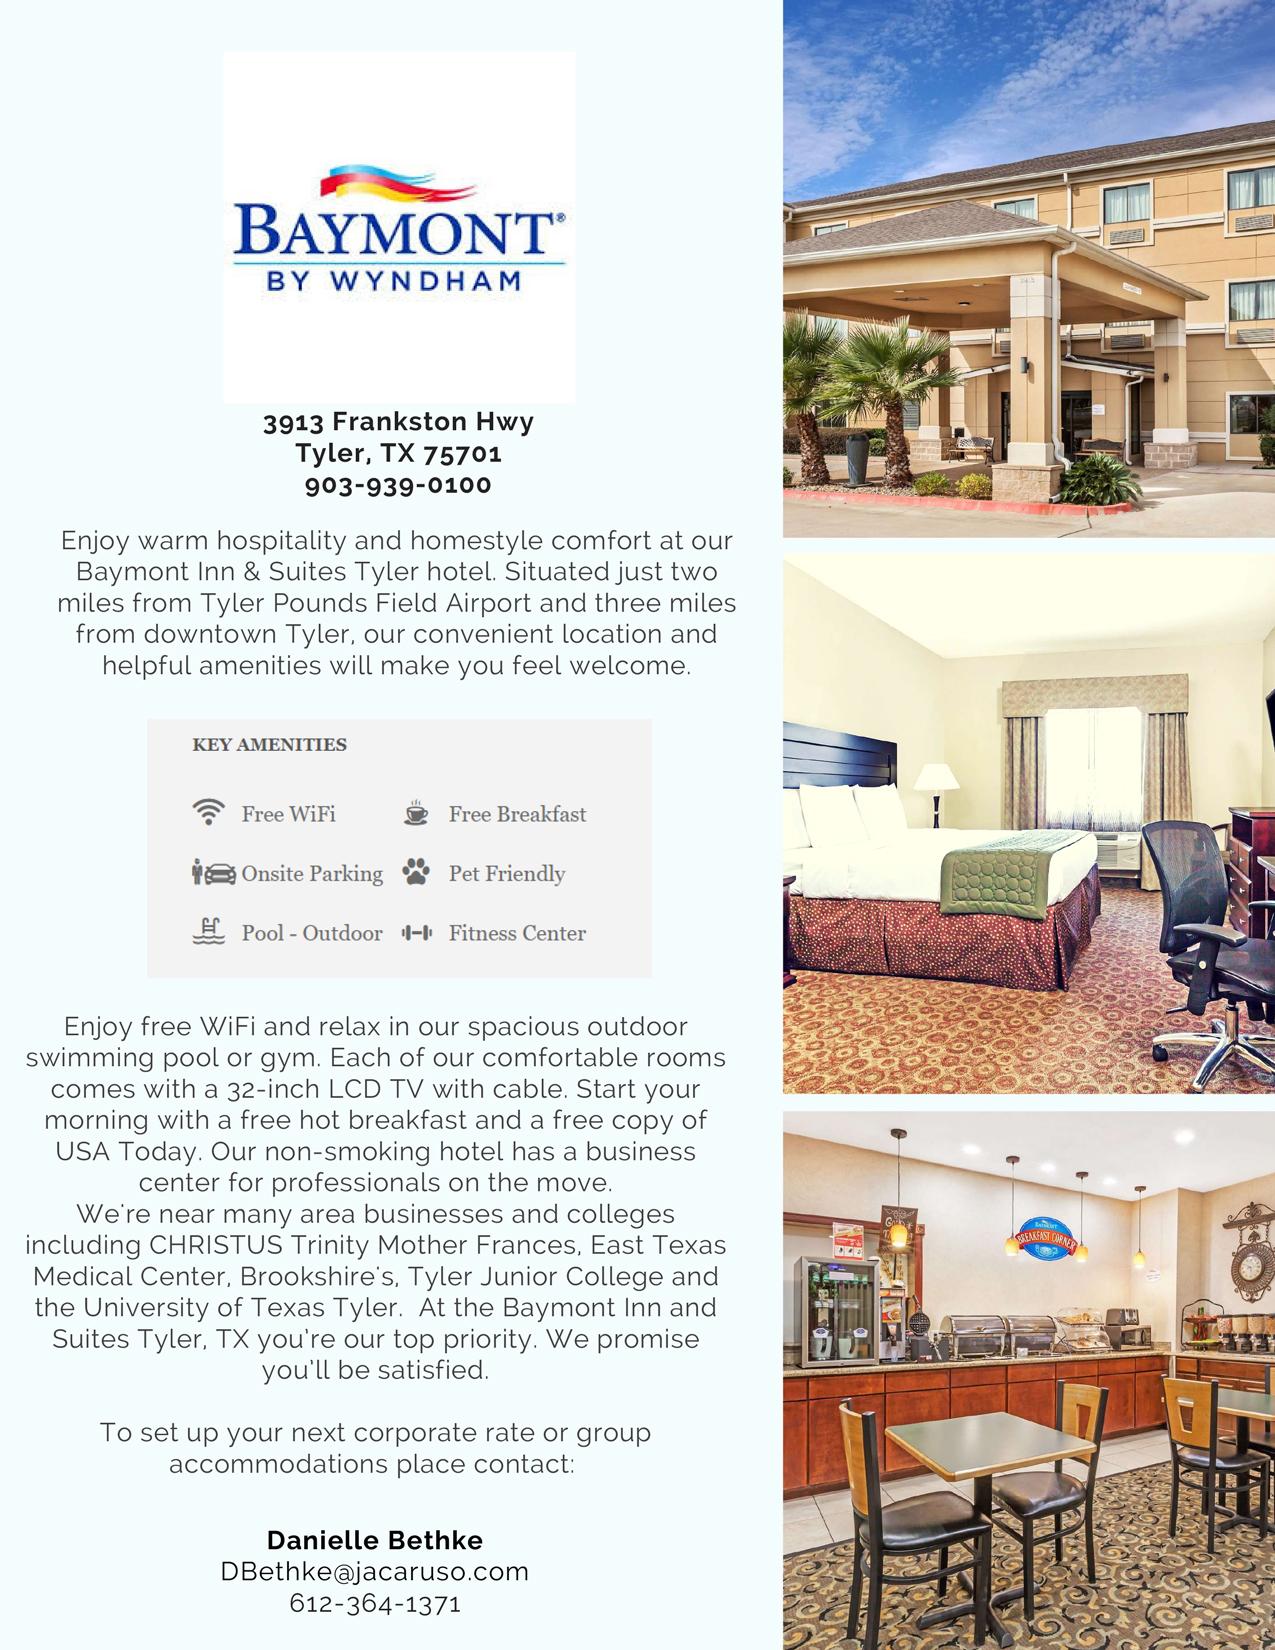 Baymont-Tyler-TX-Property-Flyer.jpg